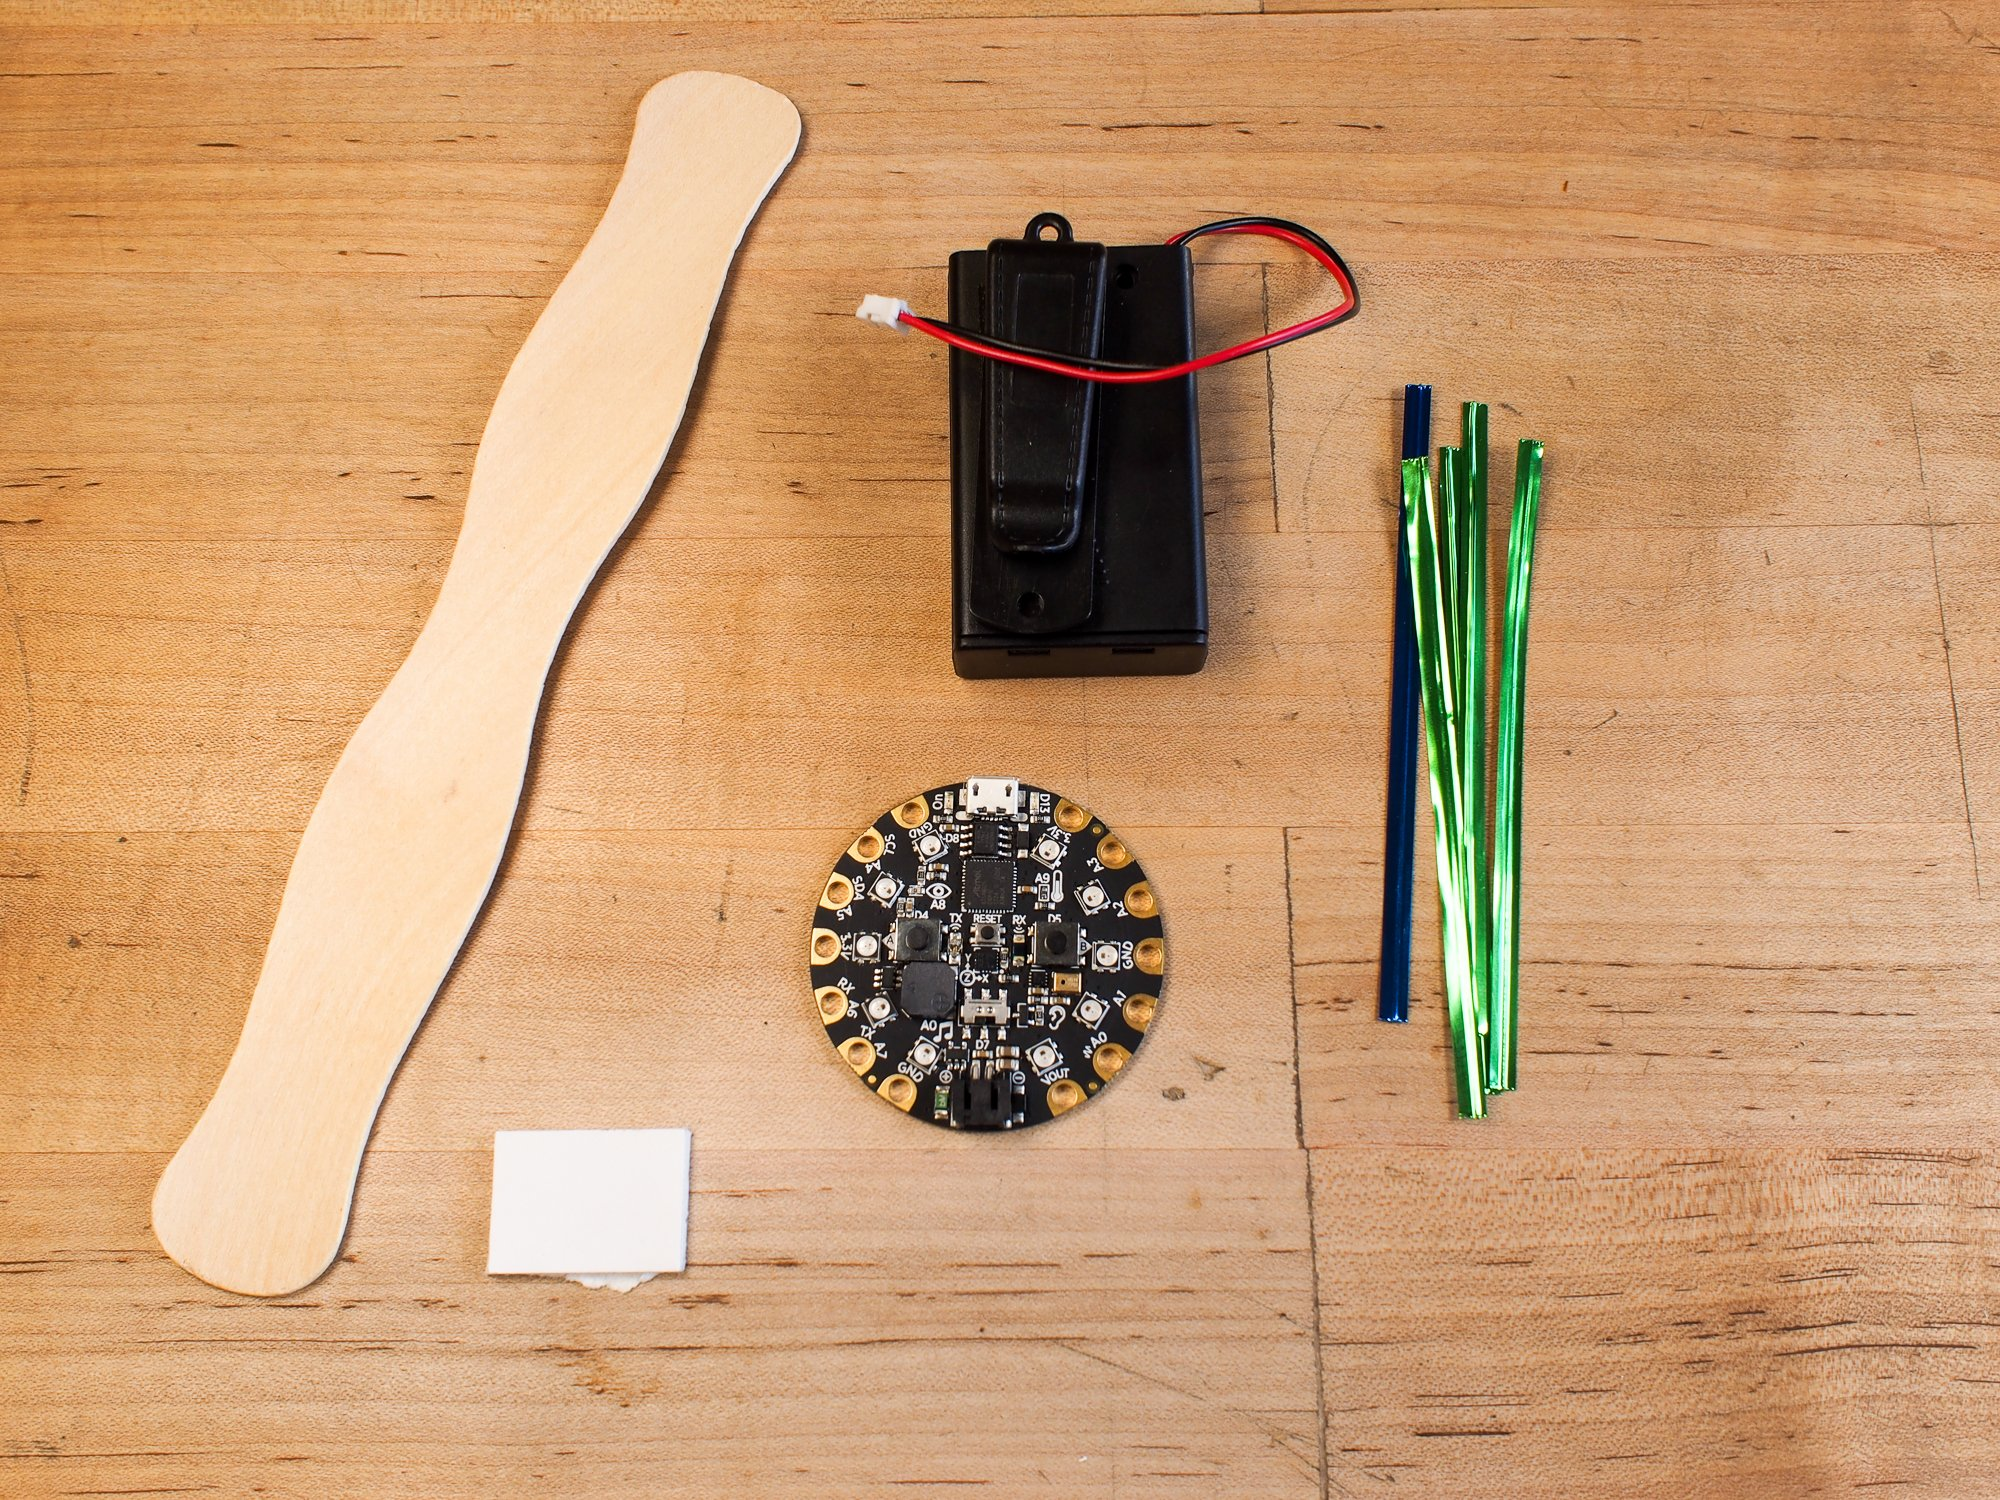 circuitpython_PC110651_2k.jpg